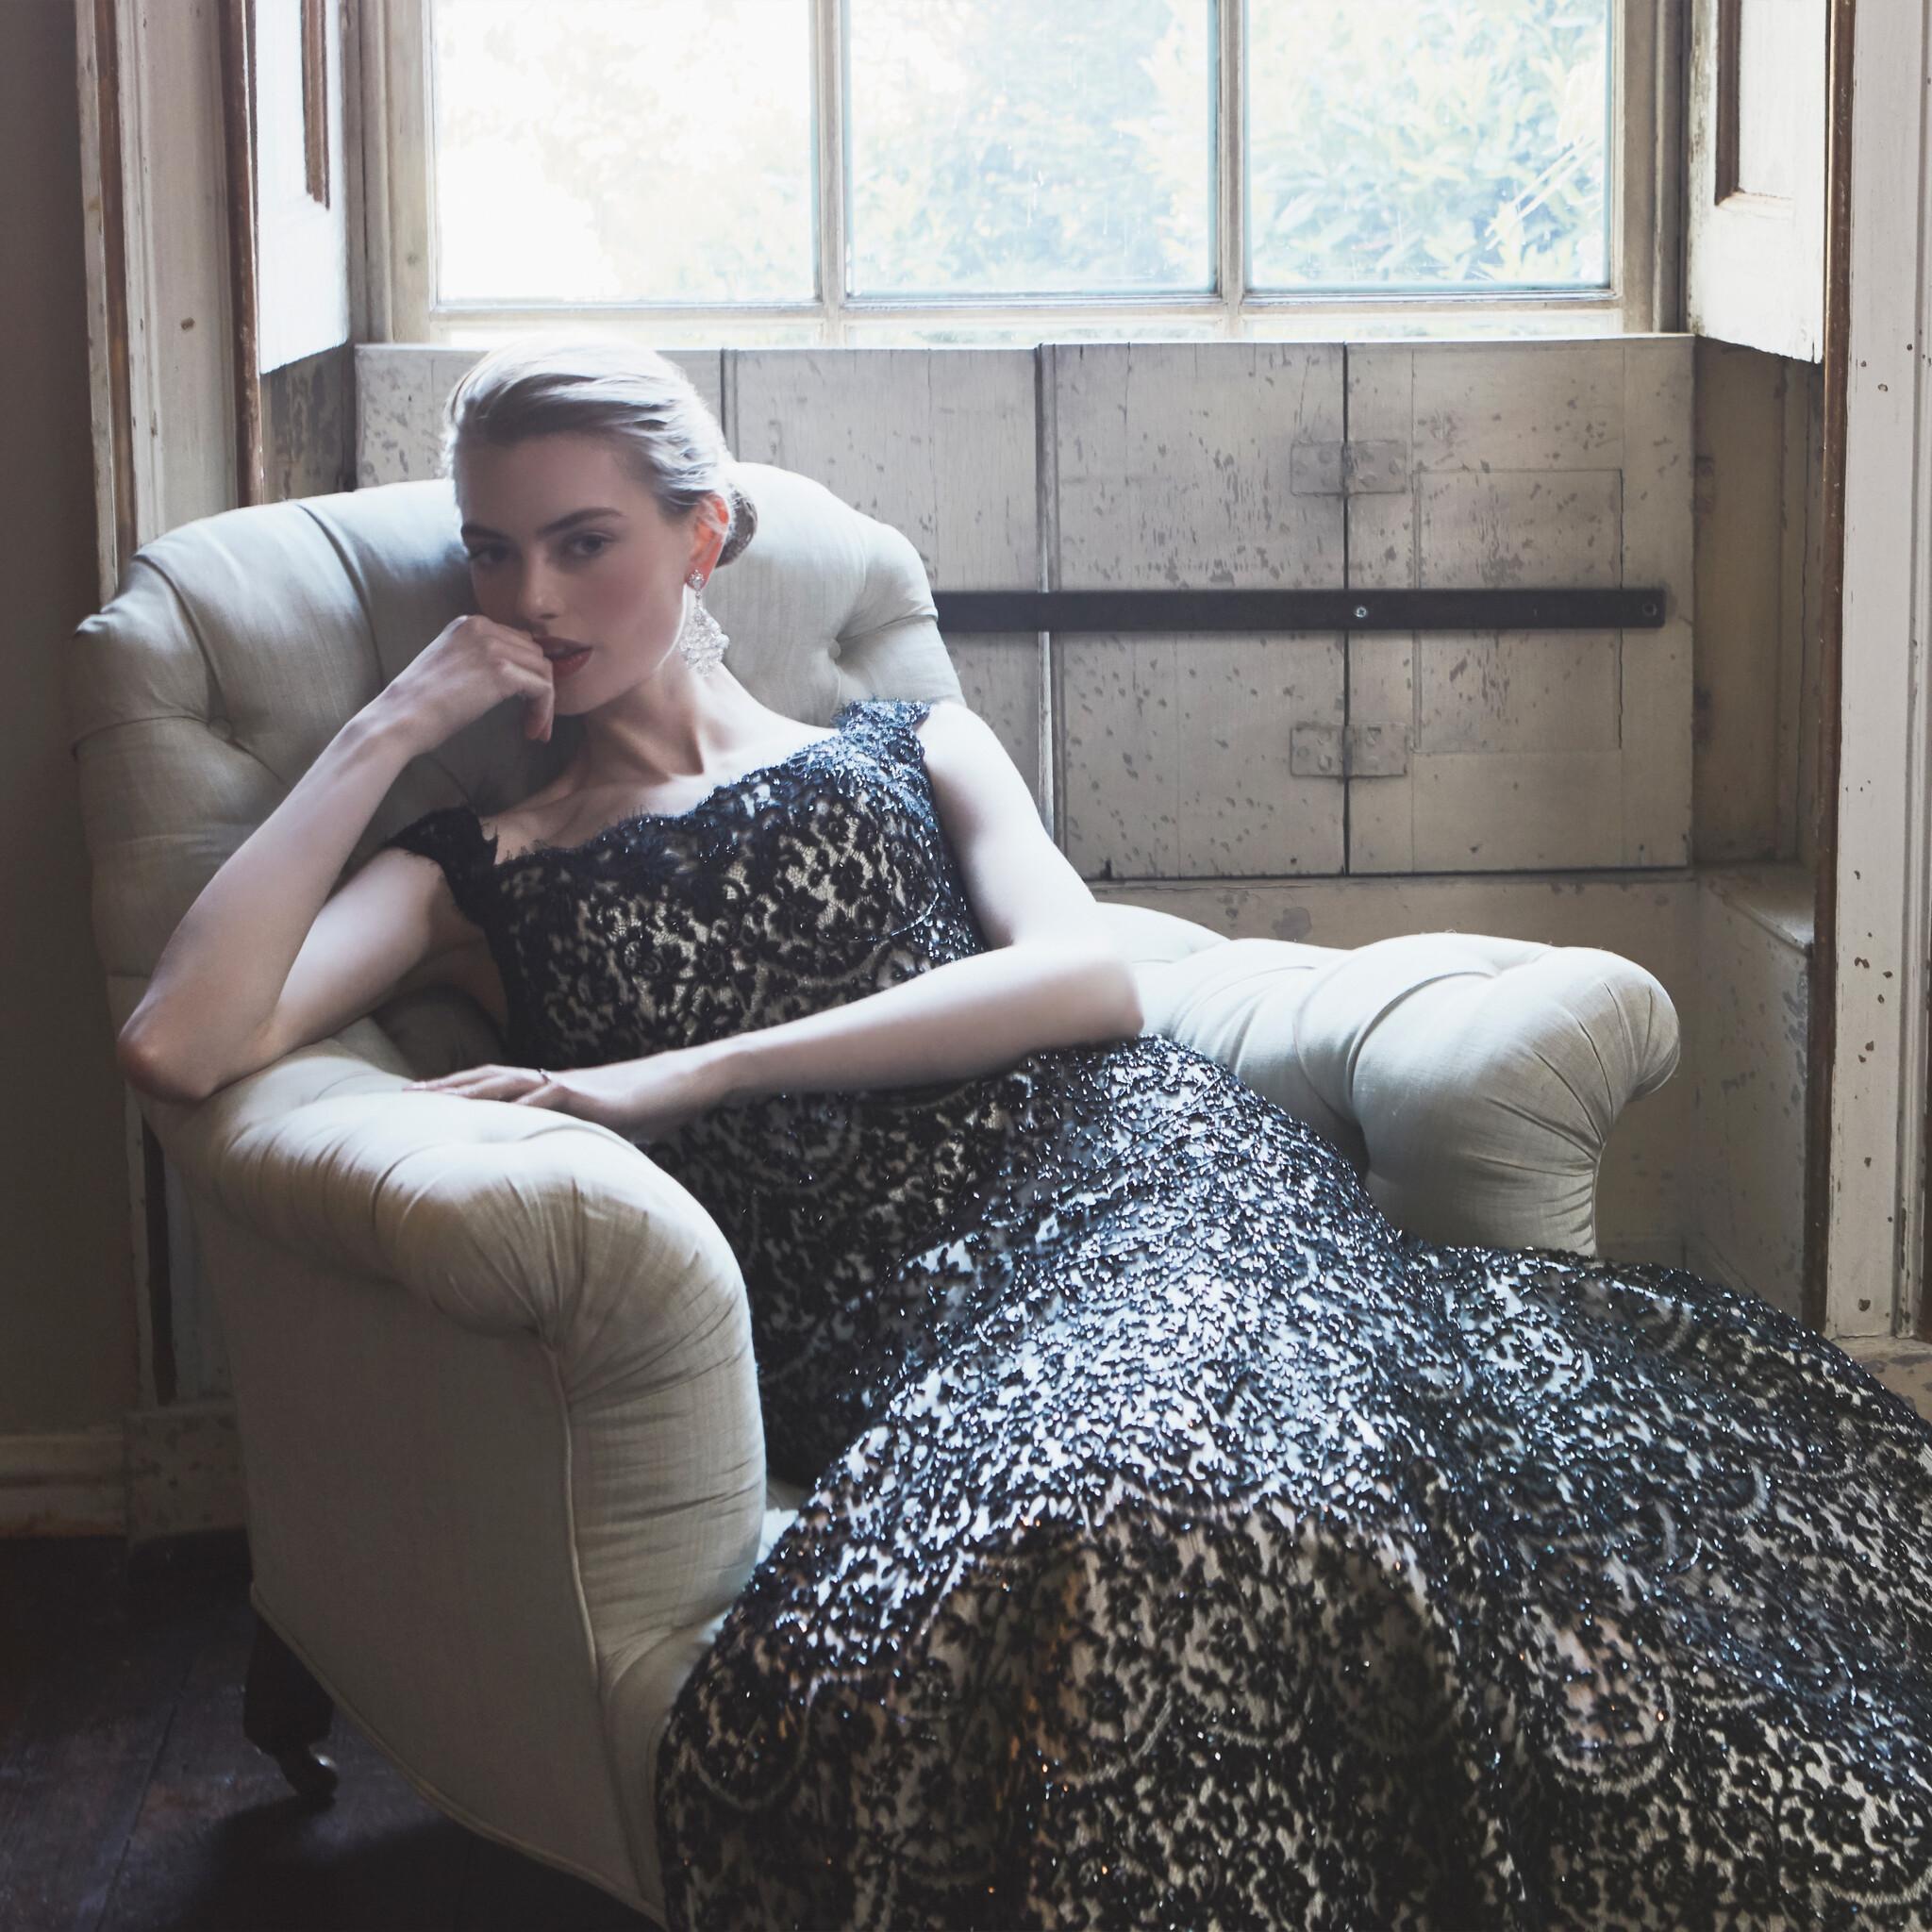 Phillipa-Lepley-Couture-Wedding-Dress-Bespoke-Eveningwear-Black-Beaded-Tamsin-Evening-Gown